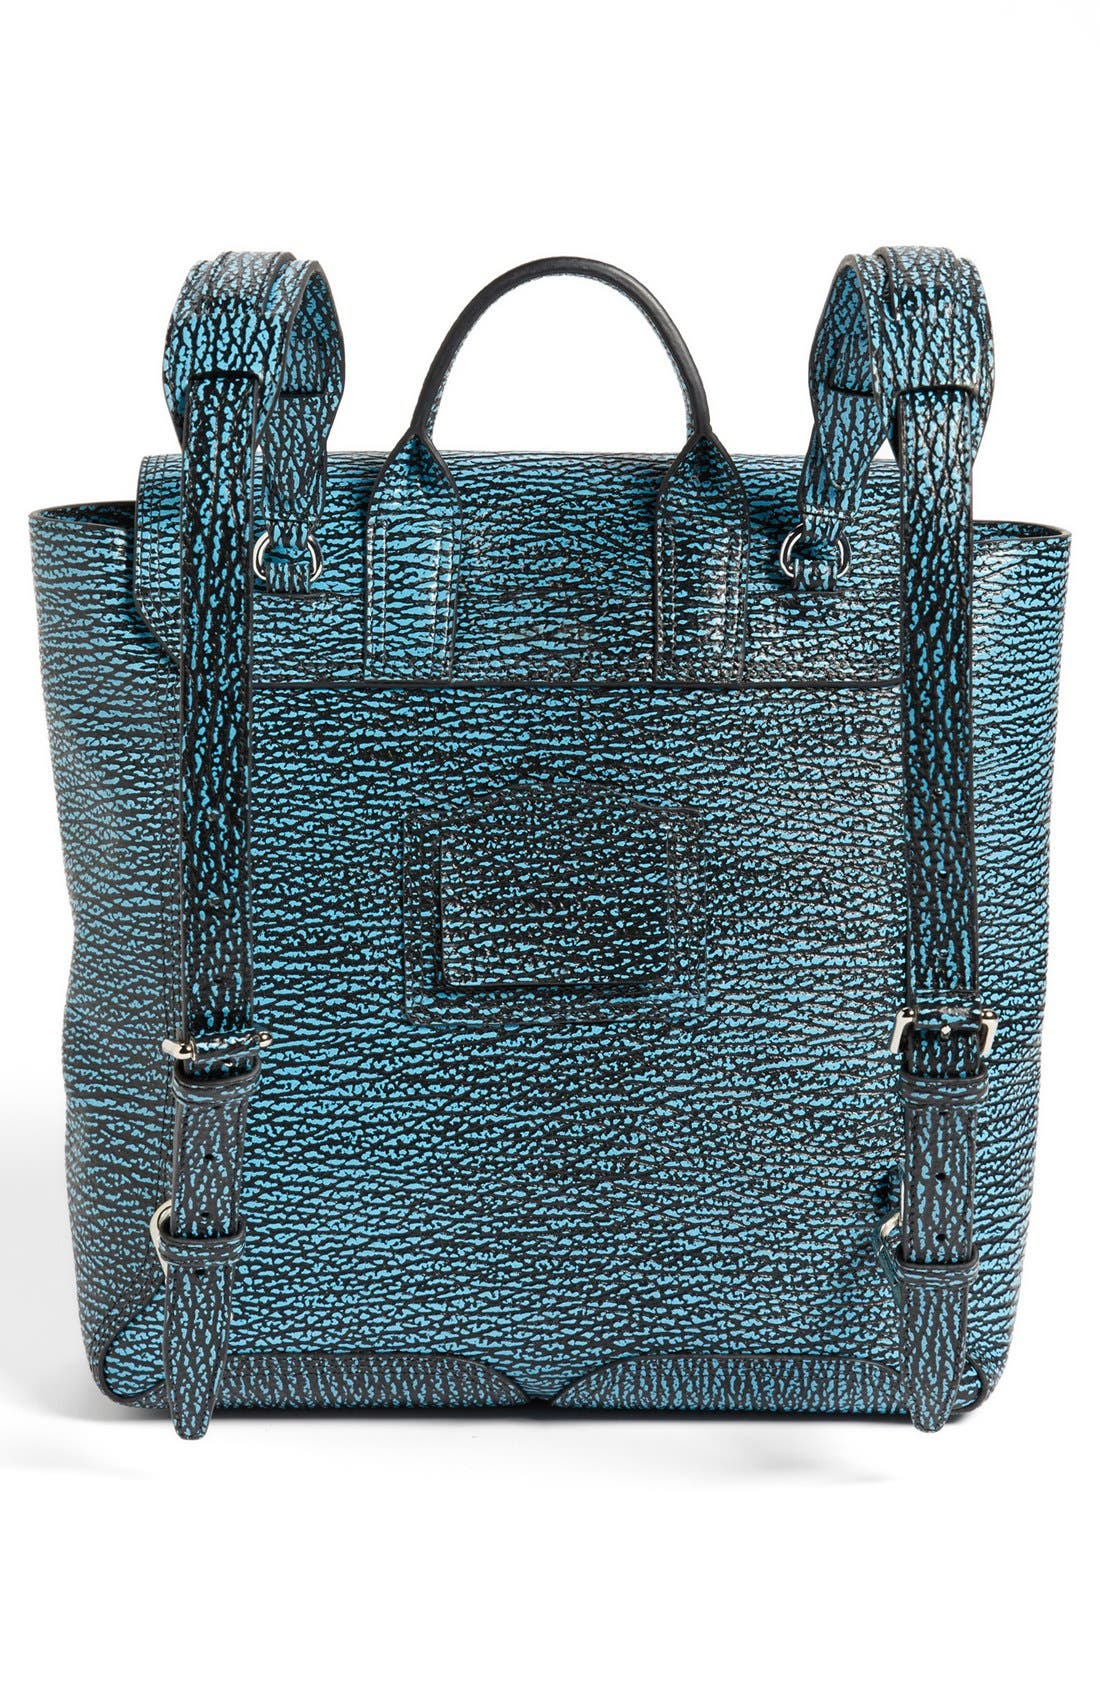 Alternate Image 3  - 3.1 Phillip Lim 'Pashli' Leather Backpack